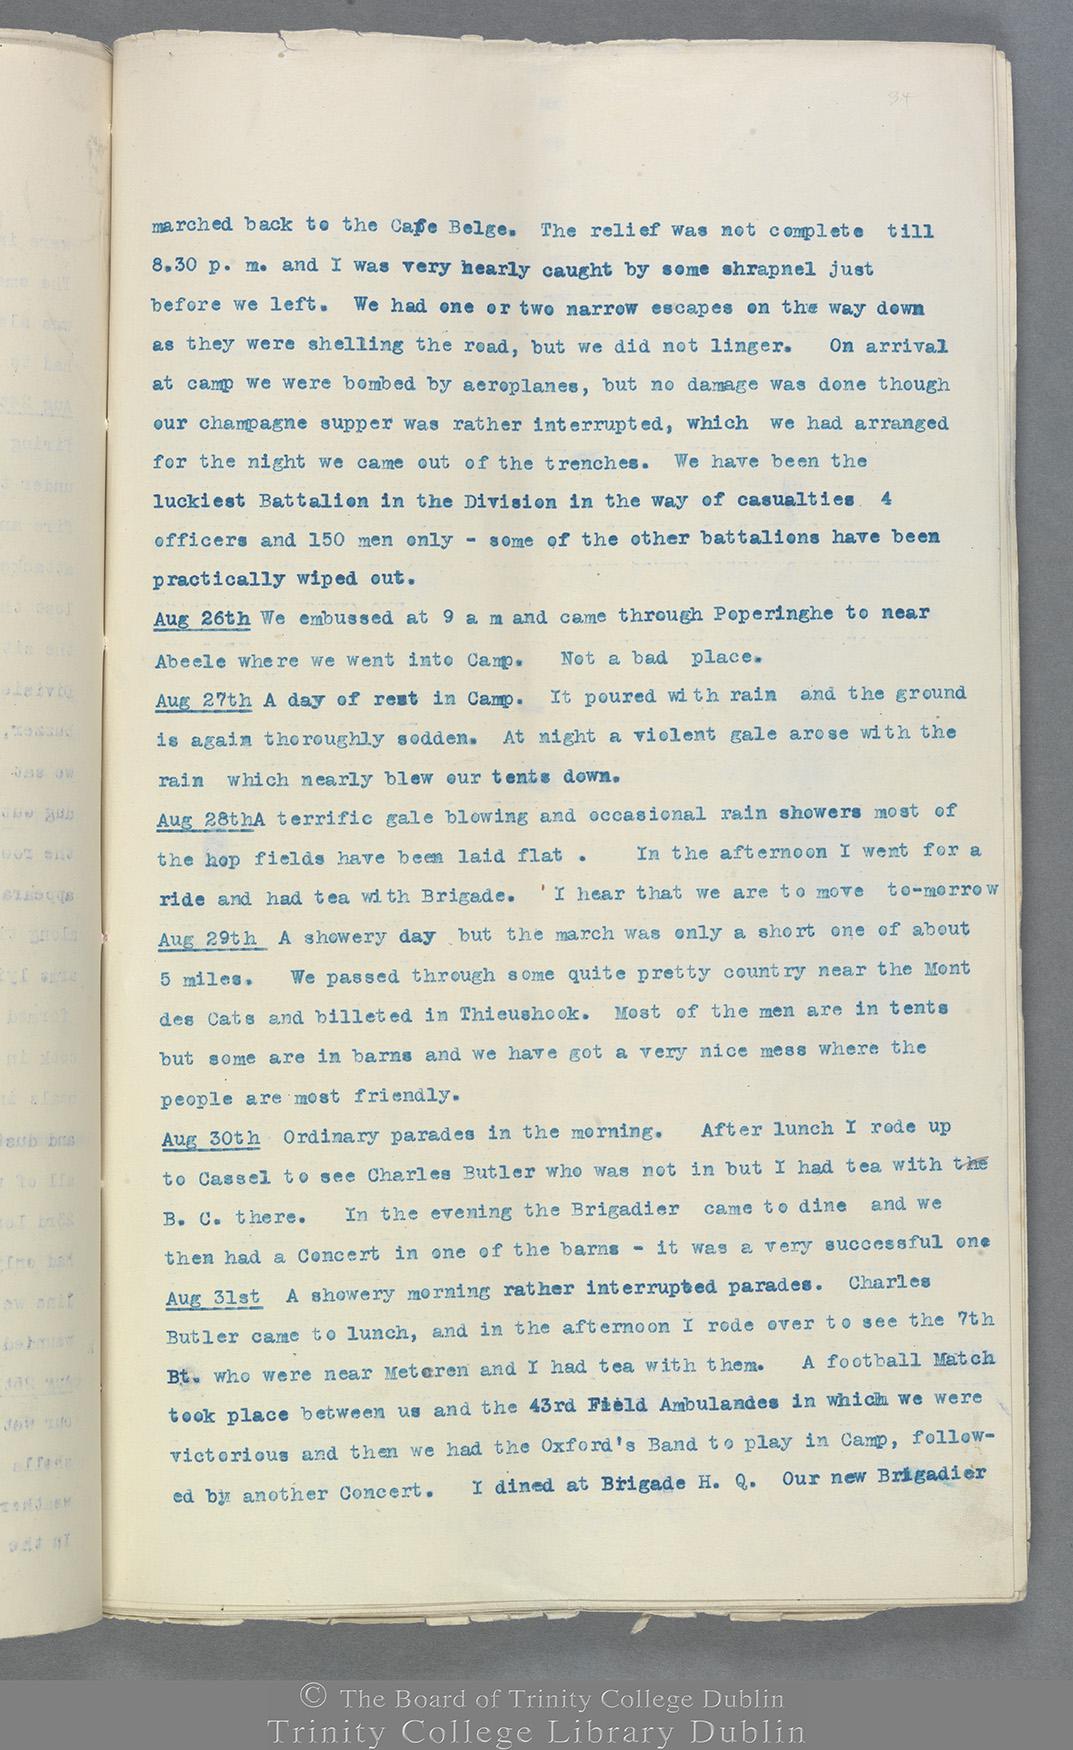 TCD MS 10822 folio 34 recto